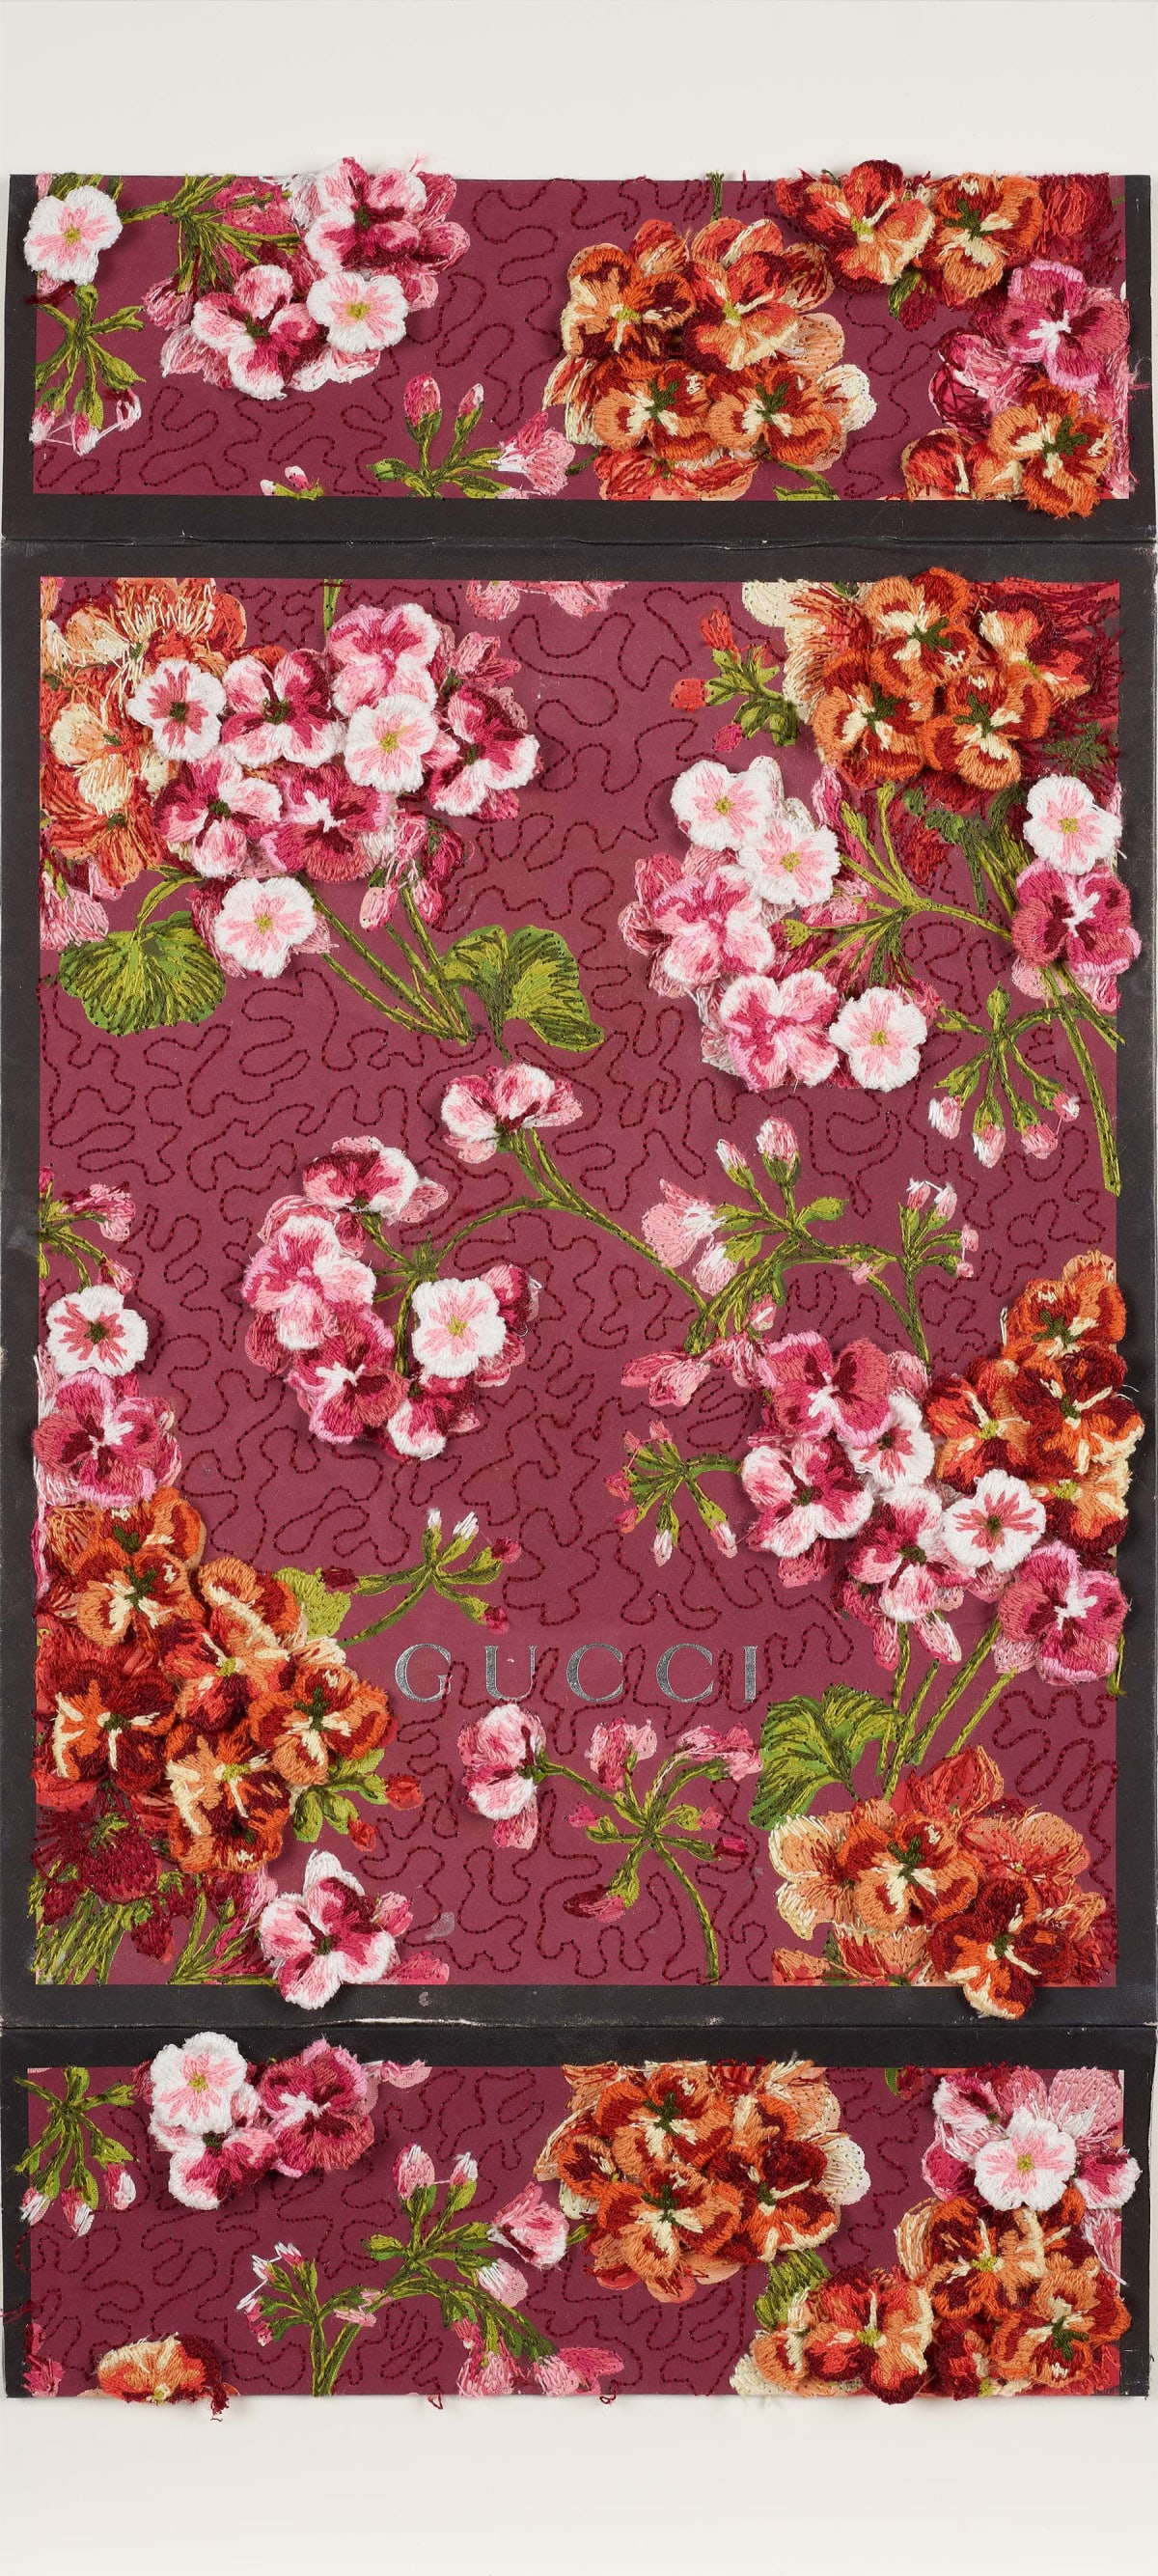 Stephen Wilson, Double Floral Texture Study, 2019